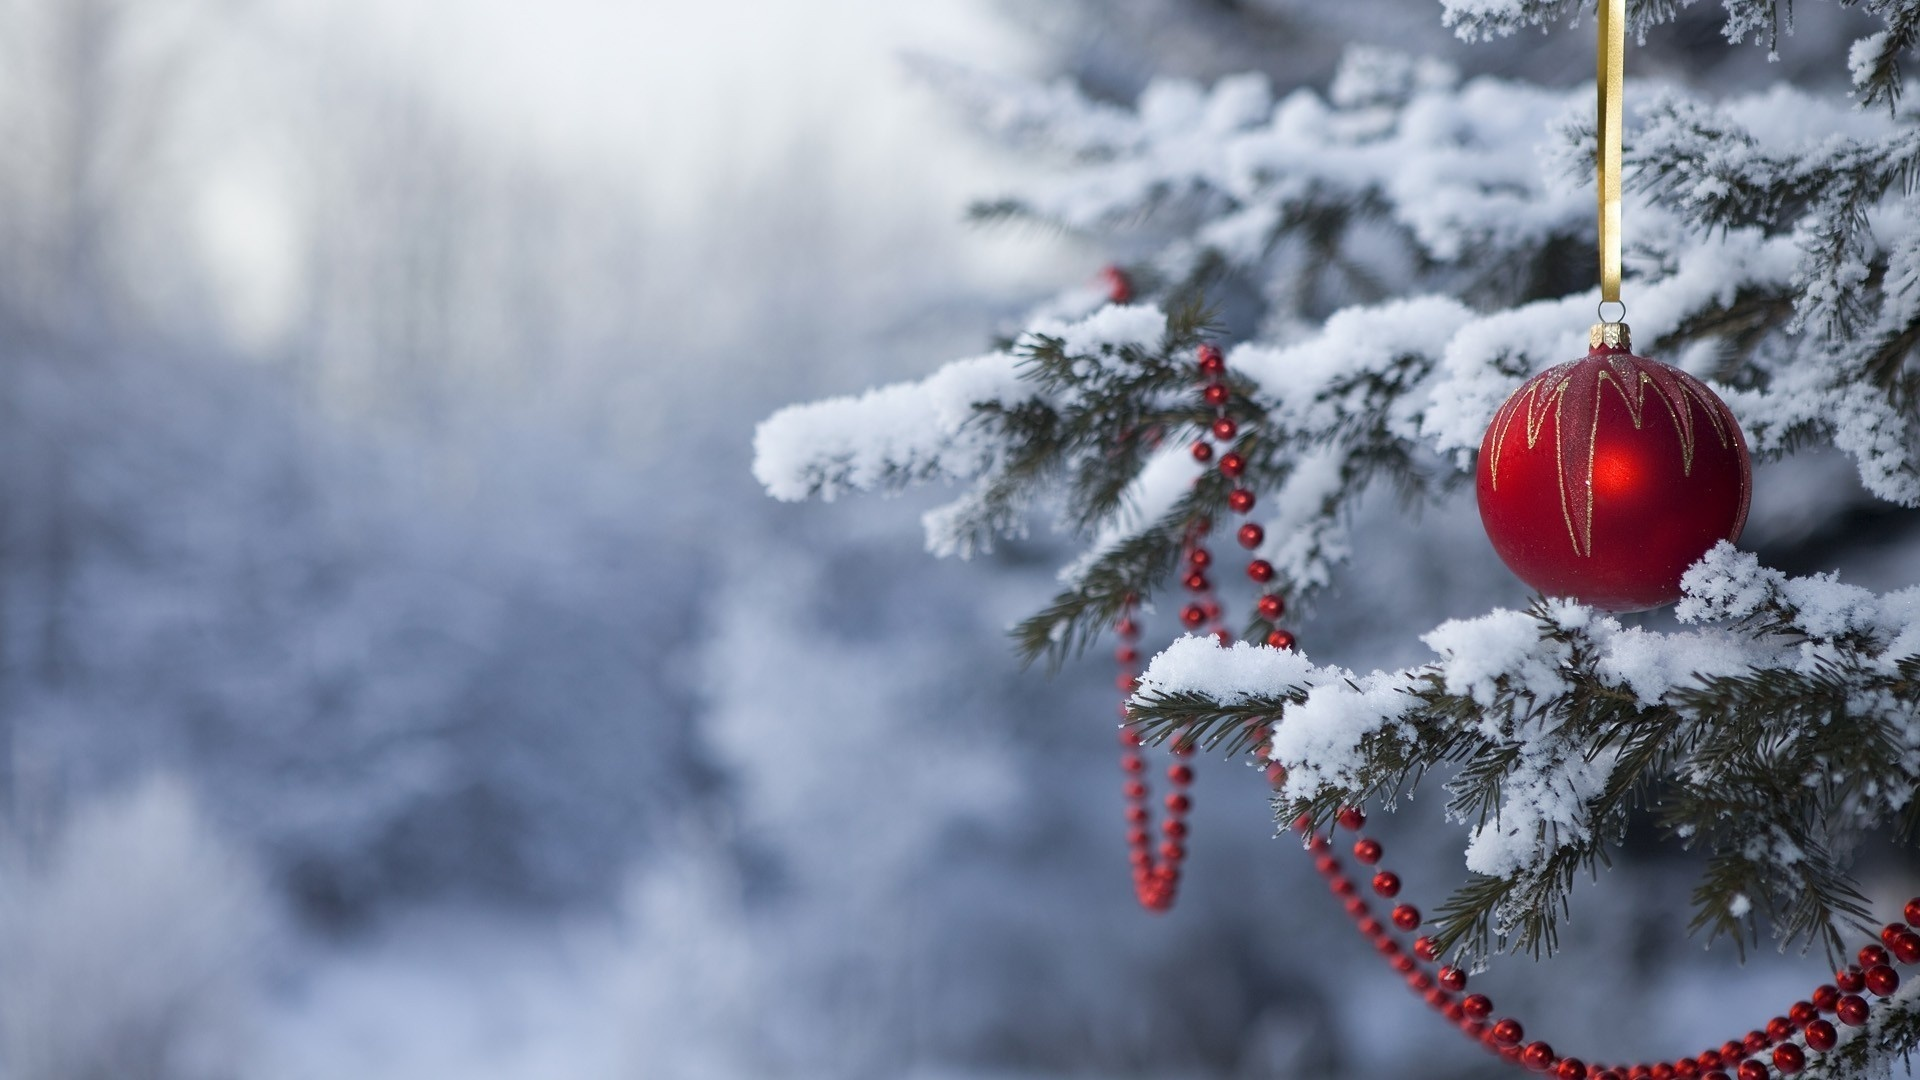 Beautiful Winter Christmas Wallpaper photos Beautiful Christmas 1920x1080